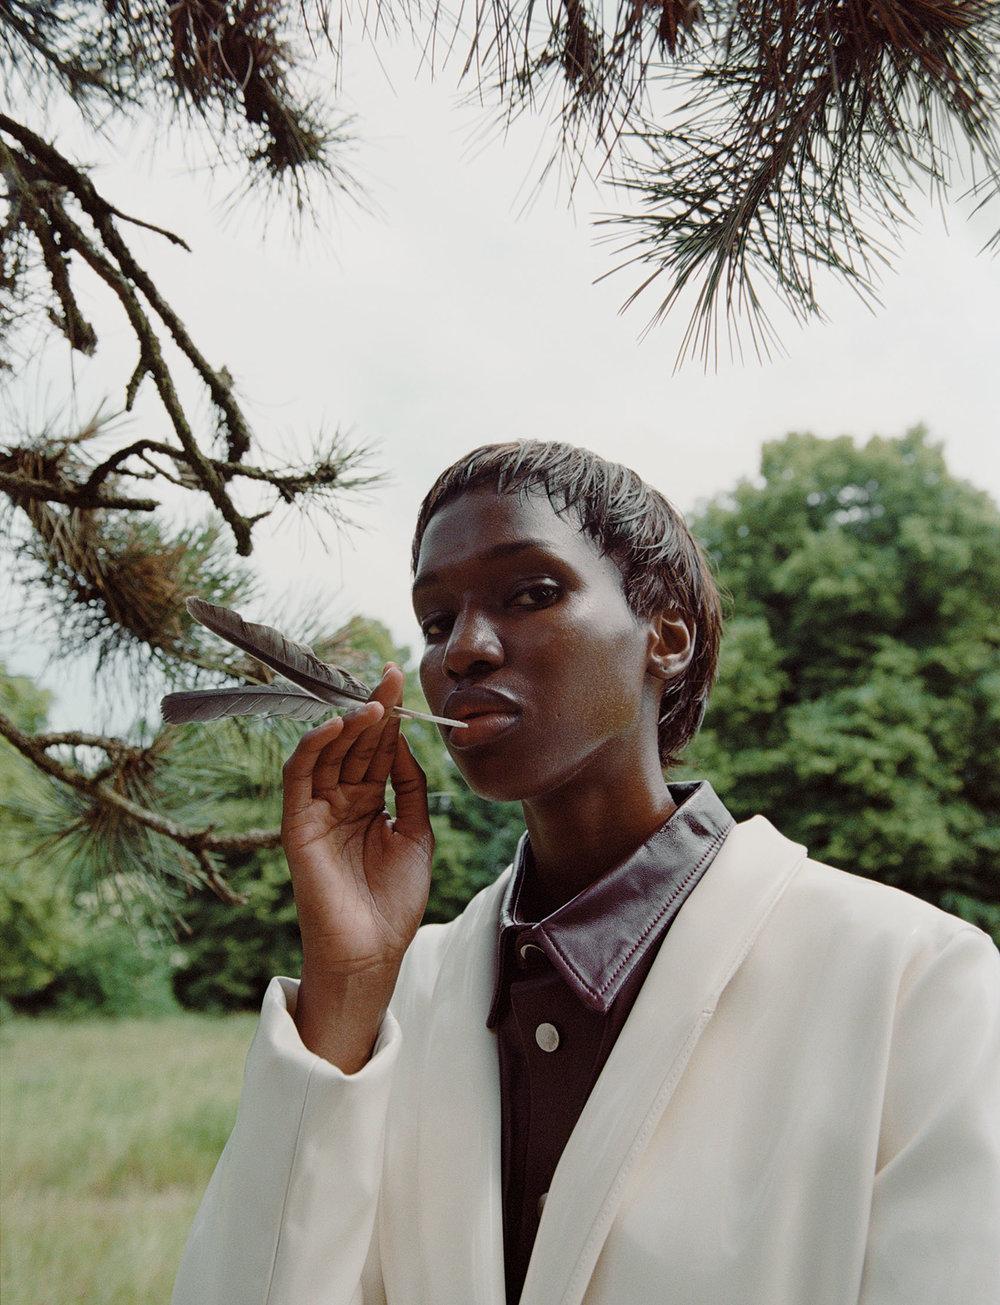 Photography by   Duljak Bergstrand   Fashion by   Tine Kozjak     Hair Stylist     André Cueto-Saavedra     Makeup Artist     Thomas Lorenz   Model     Tiah Bee